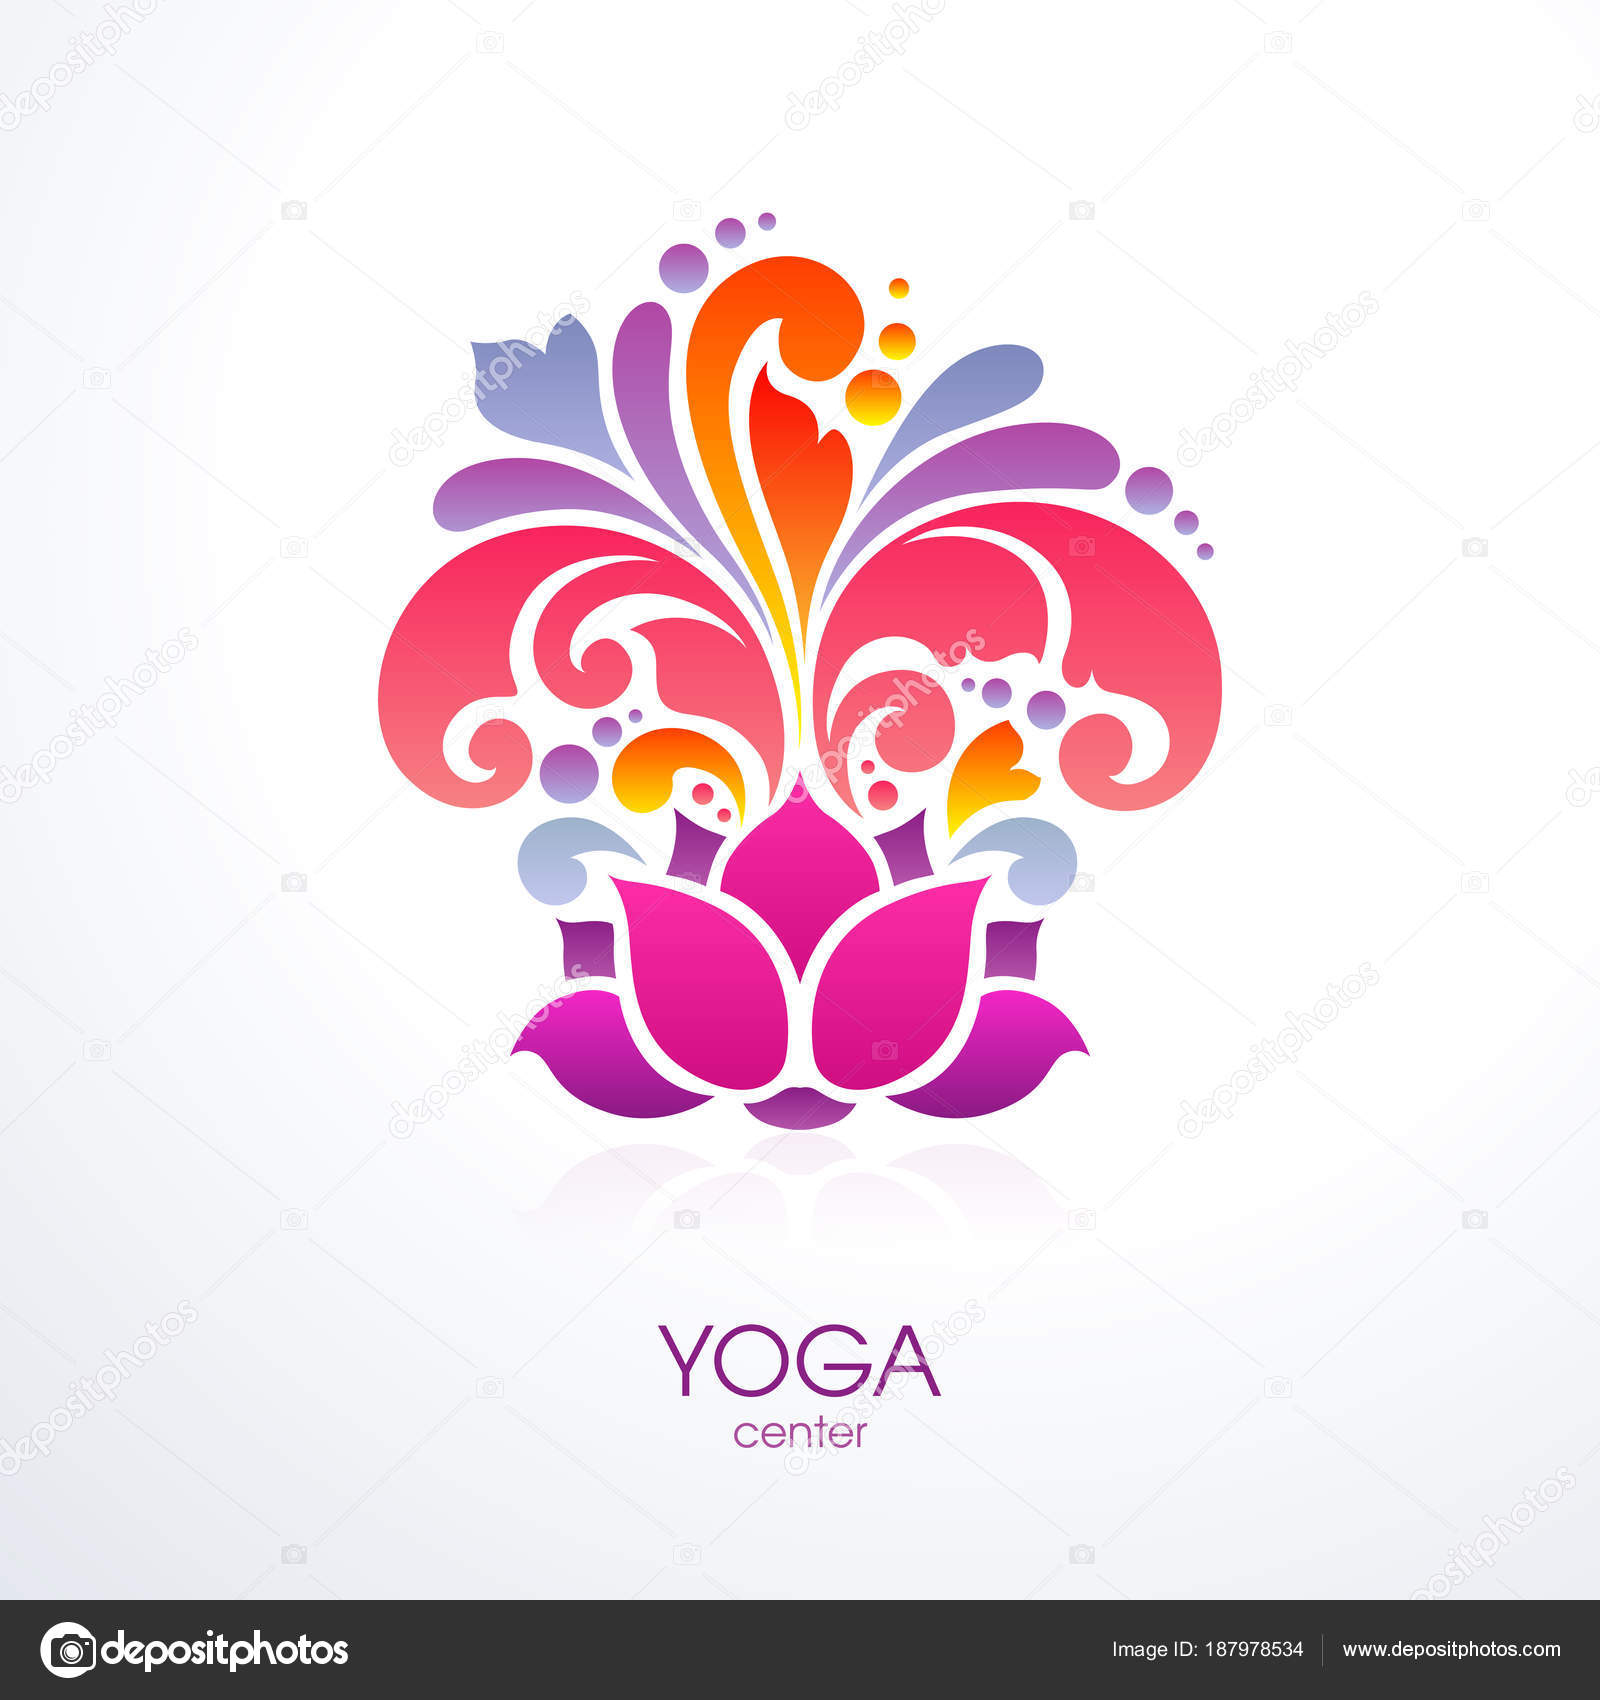 Abstract Colorful Ornate Splash Yoga Background Decorative Lotus